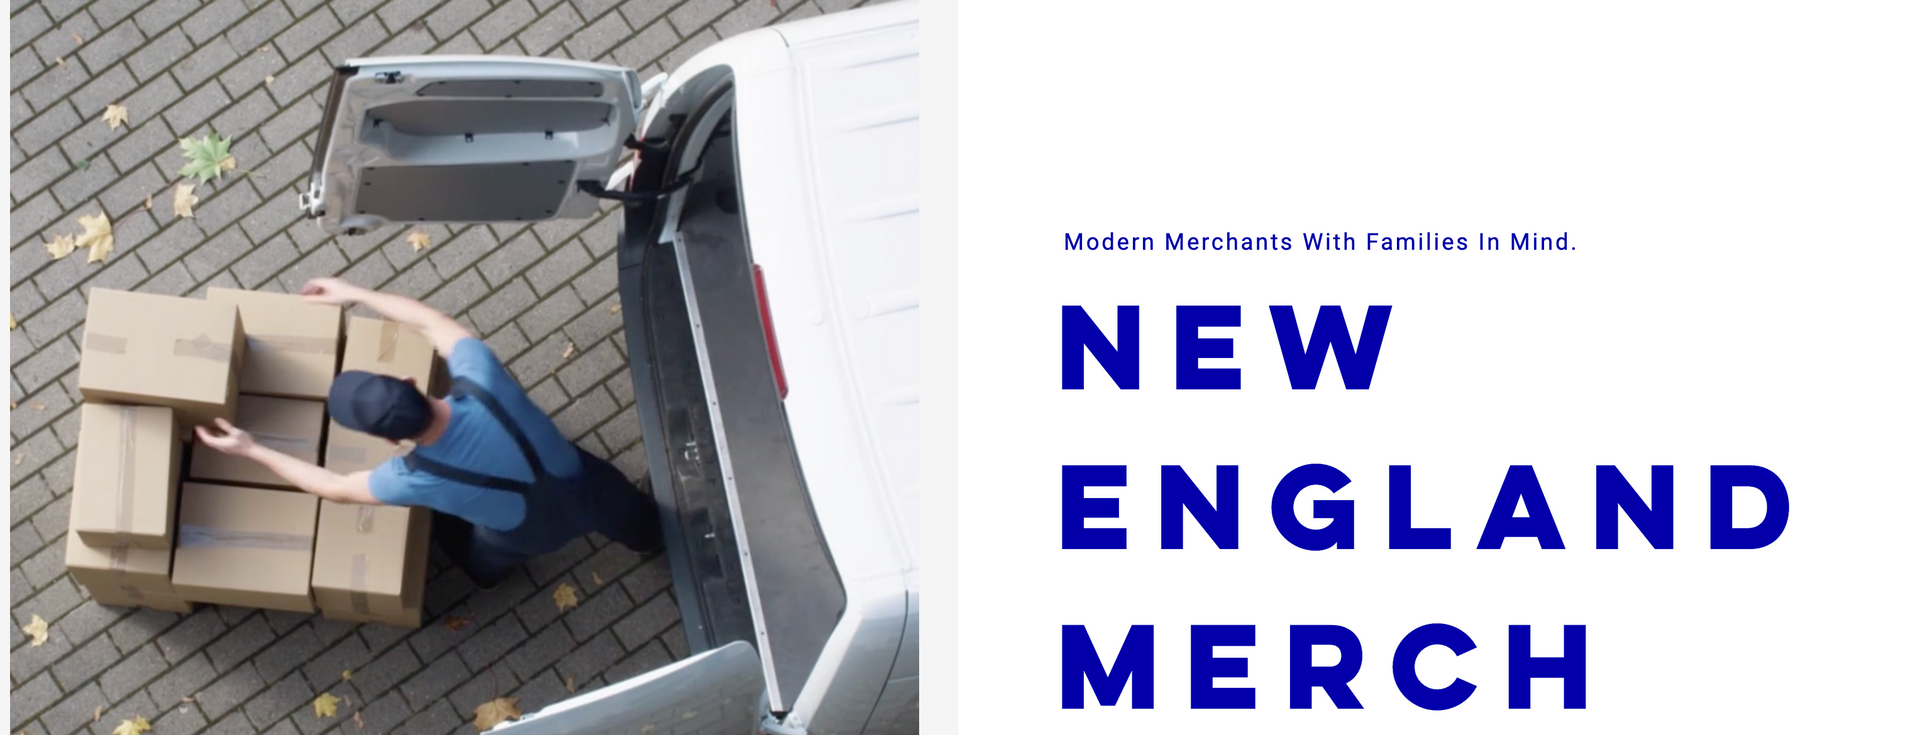 New England Merch